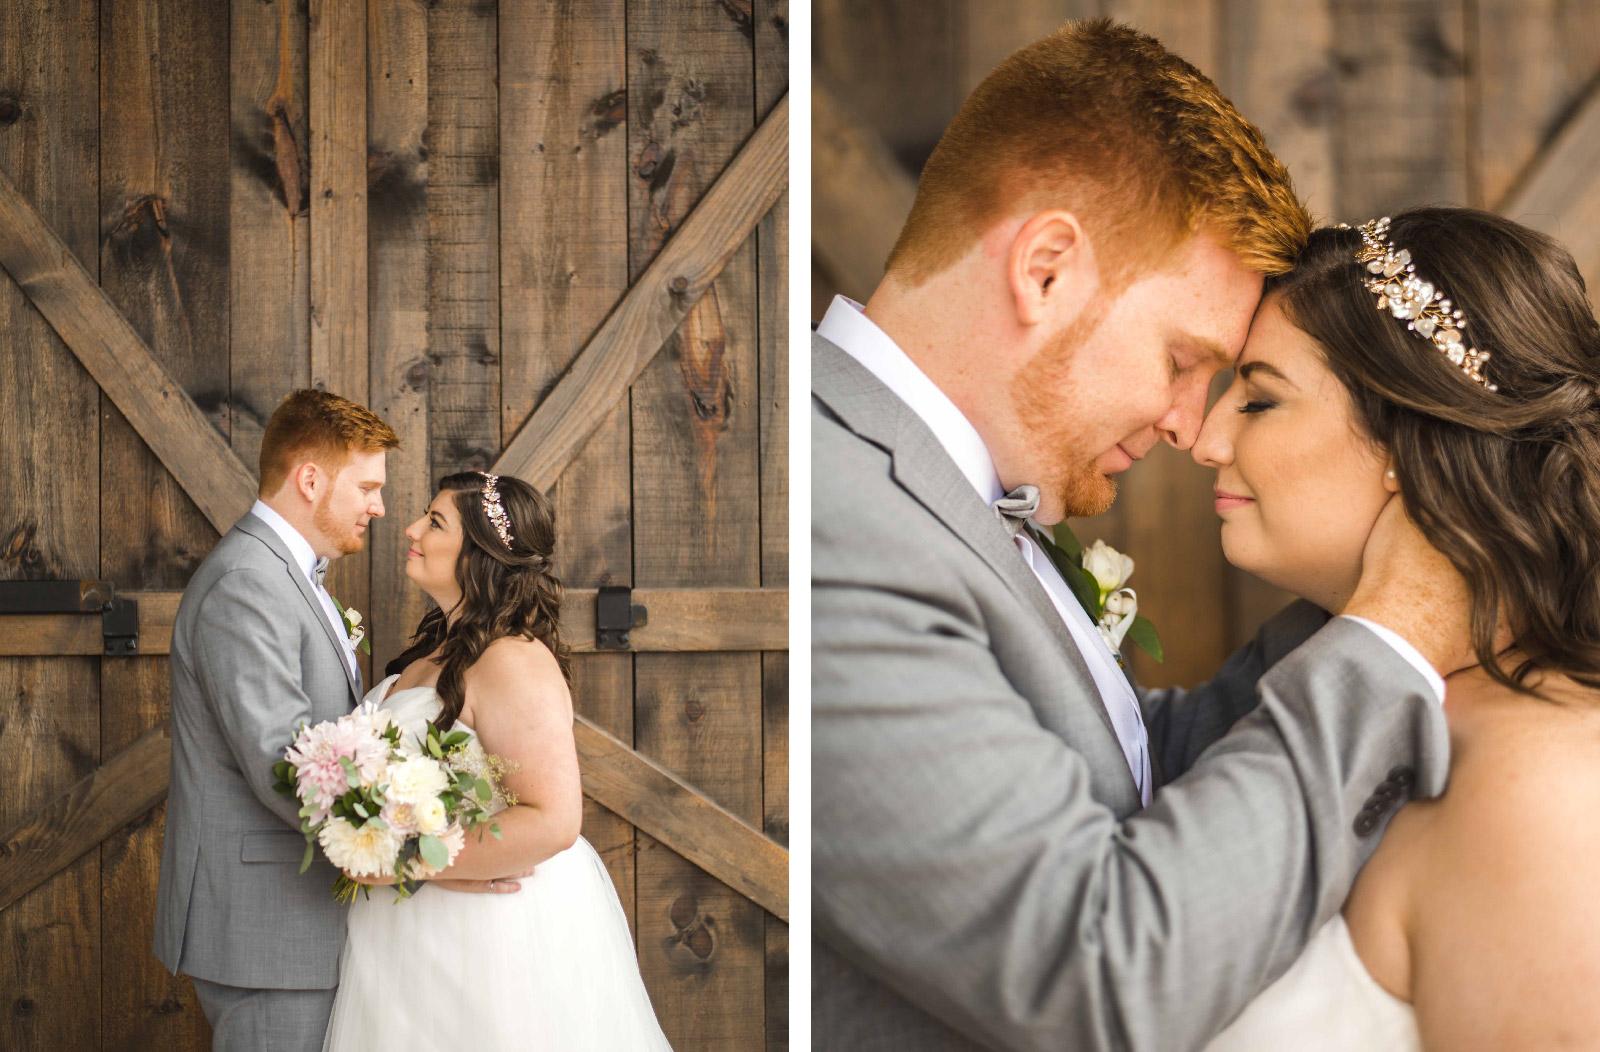 James and Laura Portrait Barn Hush Hush Photography & Film Aidan Hennebry Hamilton Wedding Photographer Videographer.jpg